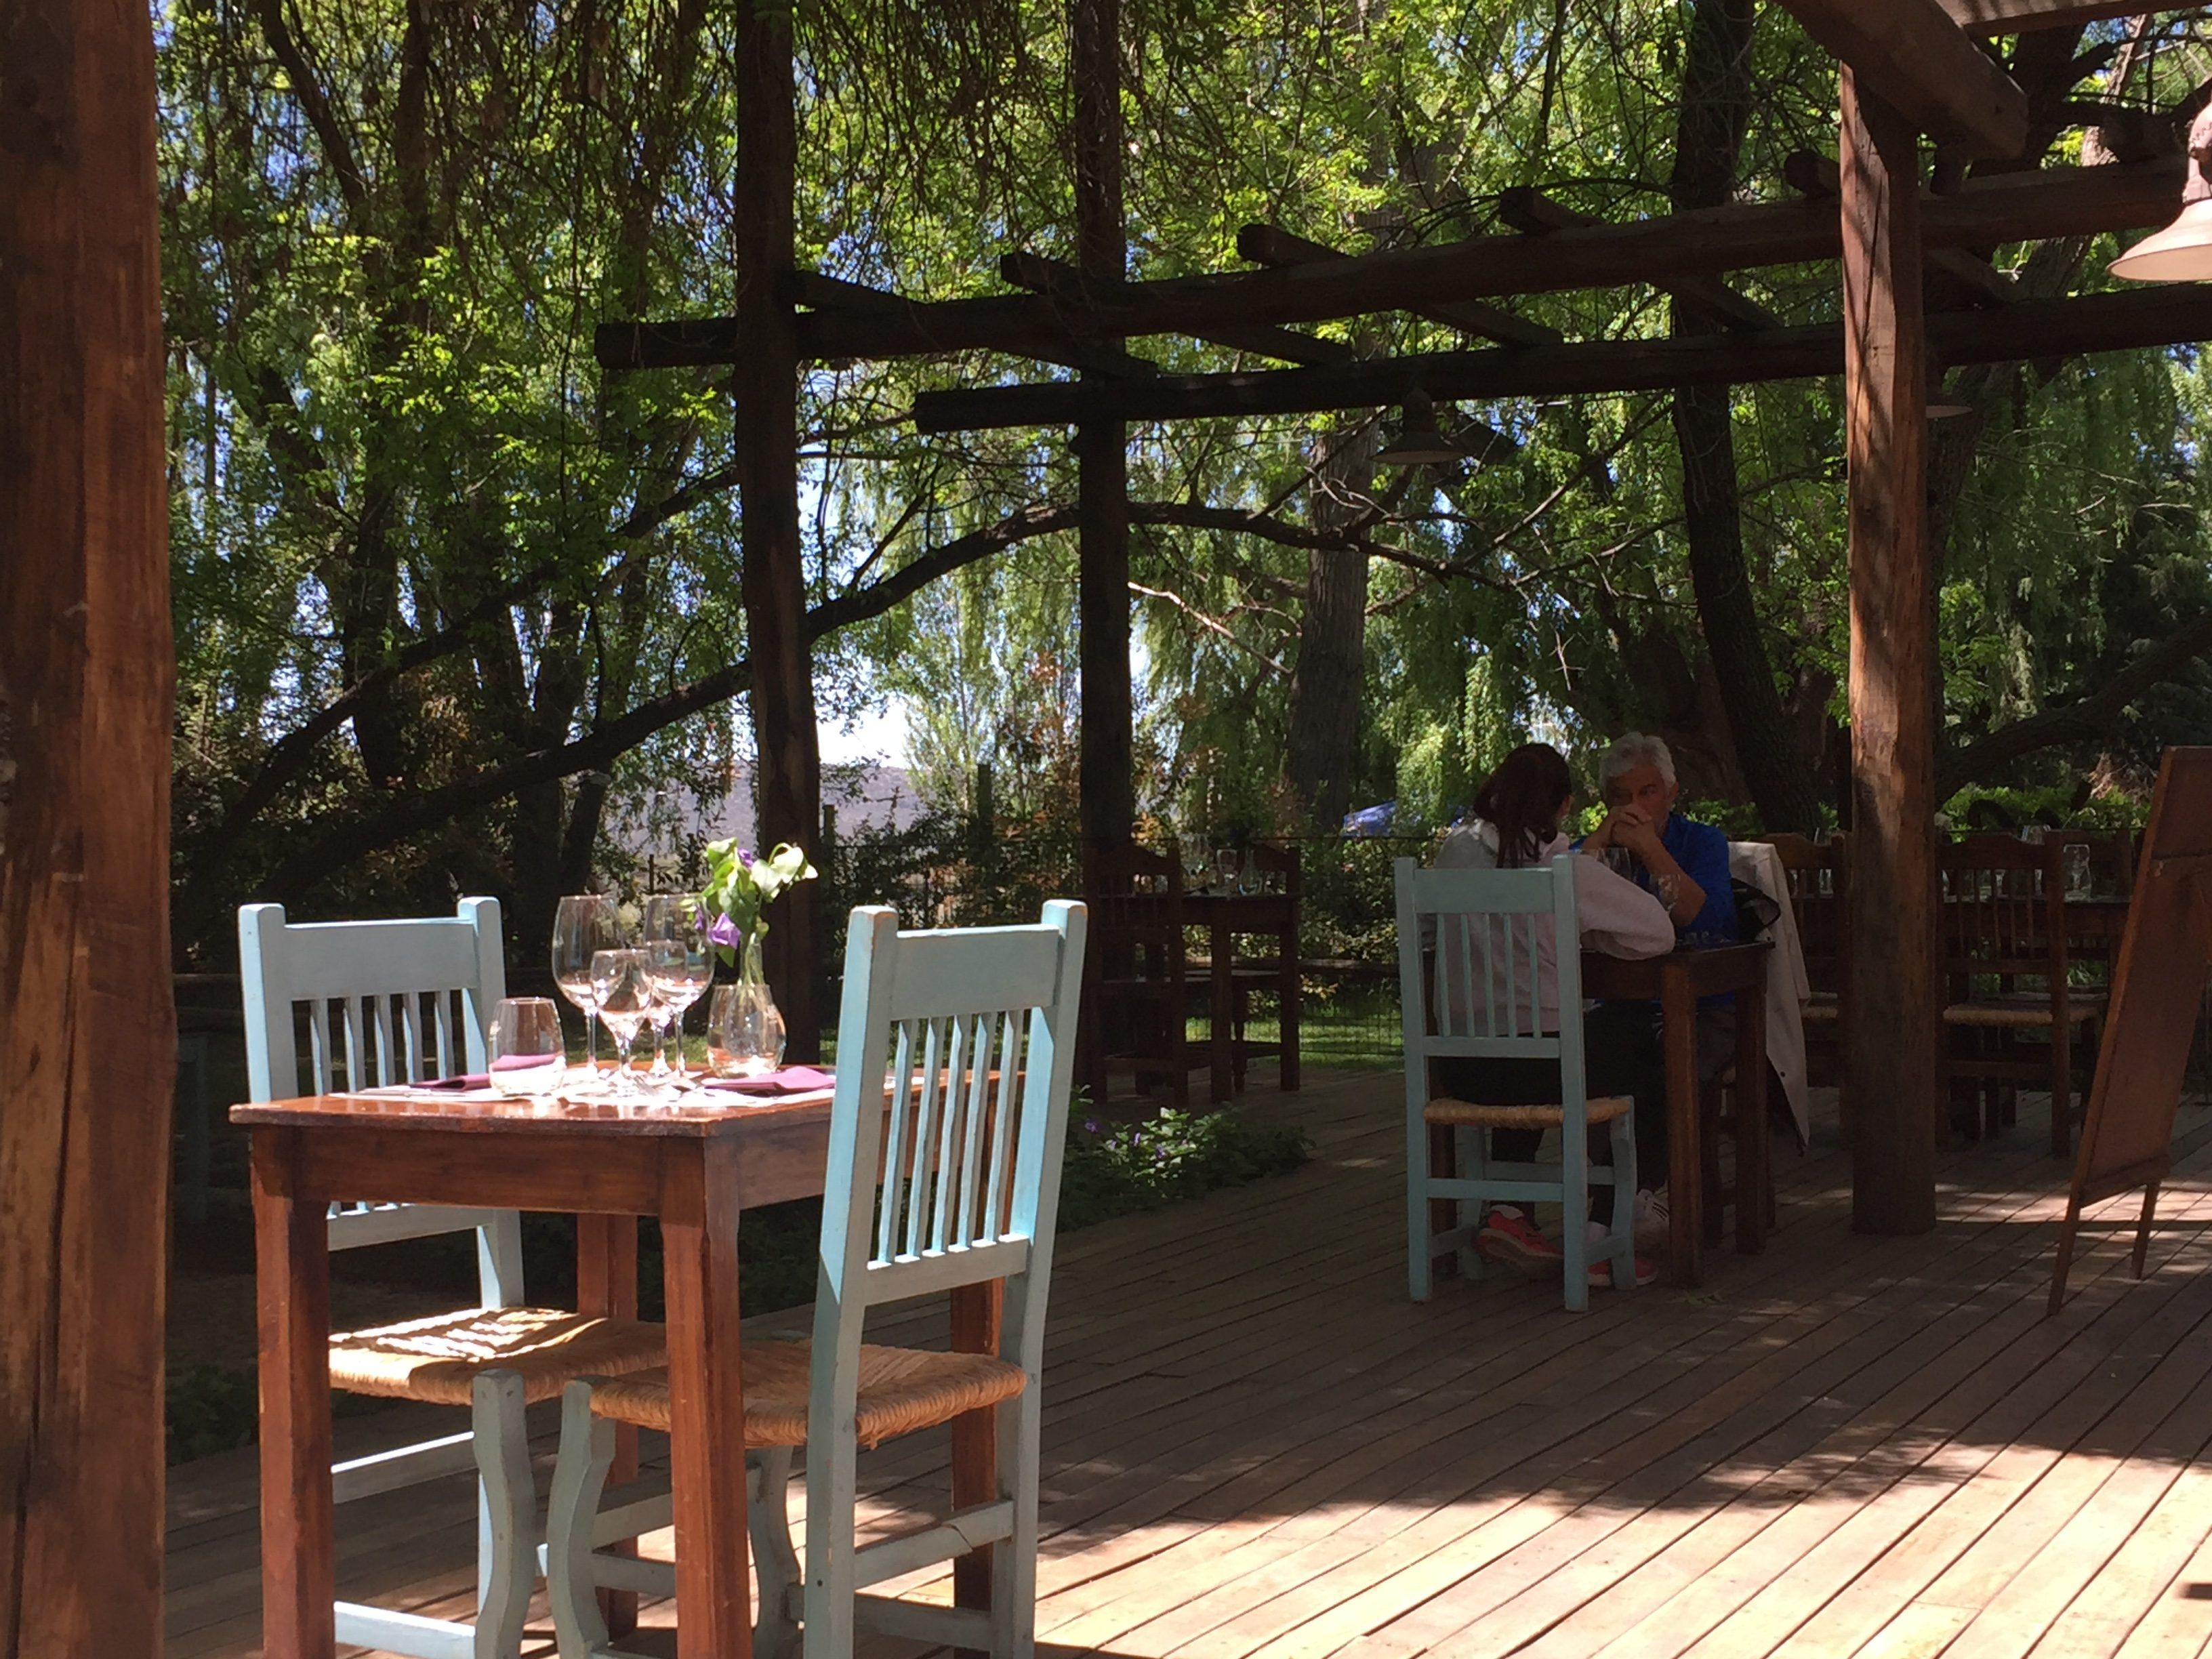 IMG 8362 e1508807142937 - Almorzando en la Bodega Atamisque de Mendoza